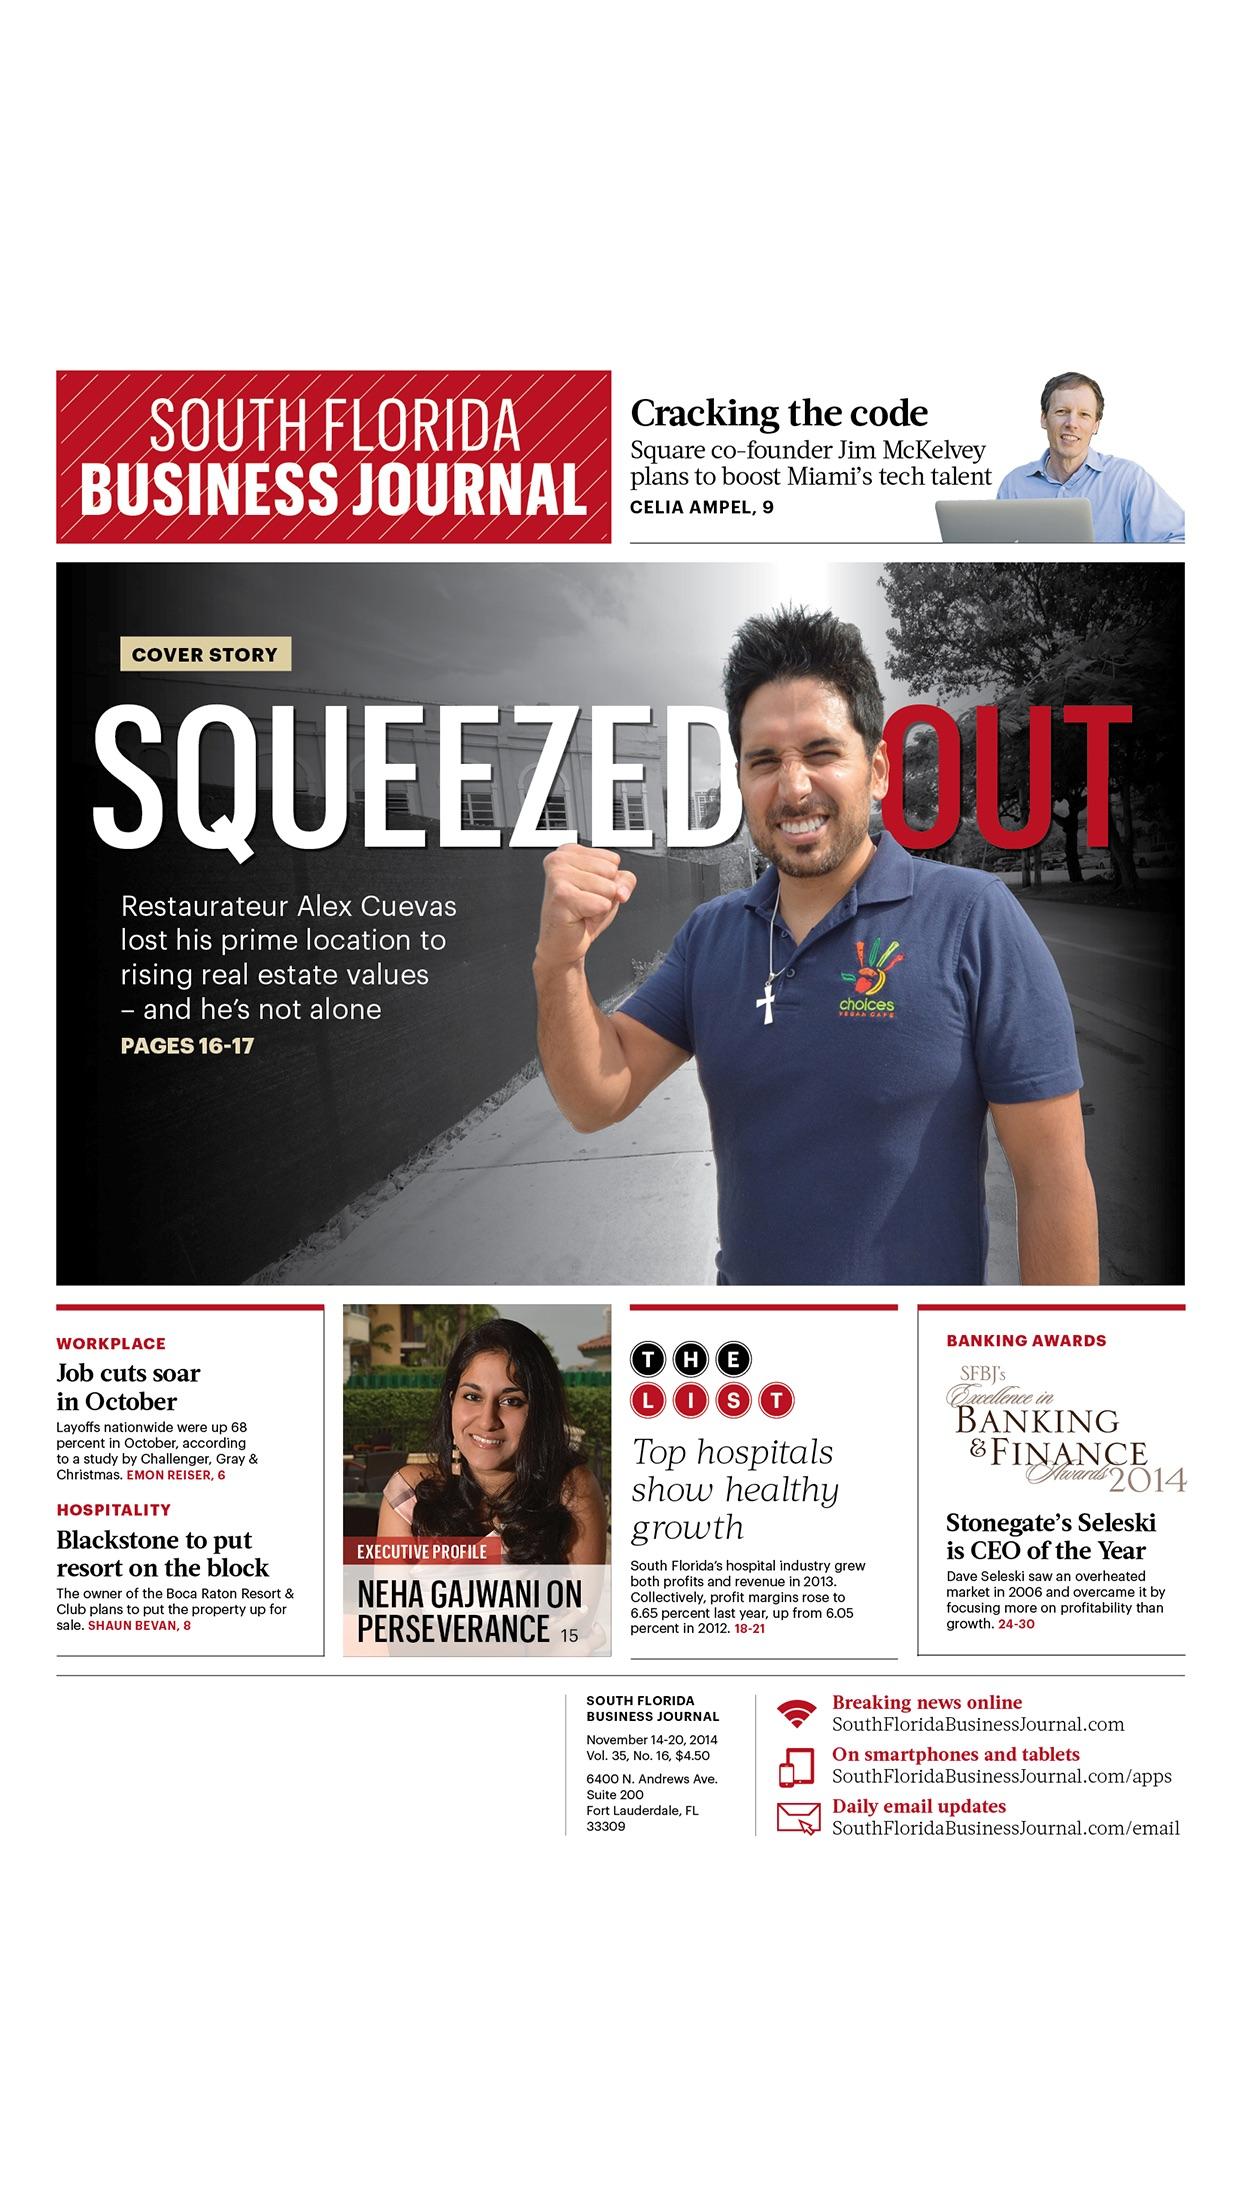 South Florida Business Journal Screenshot